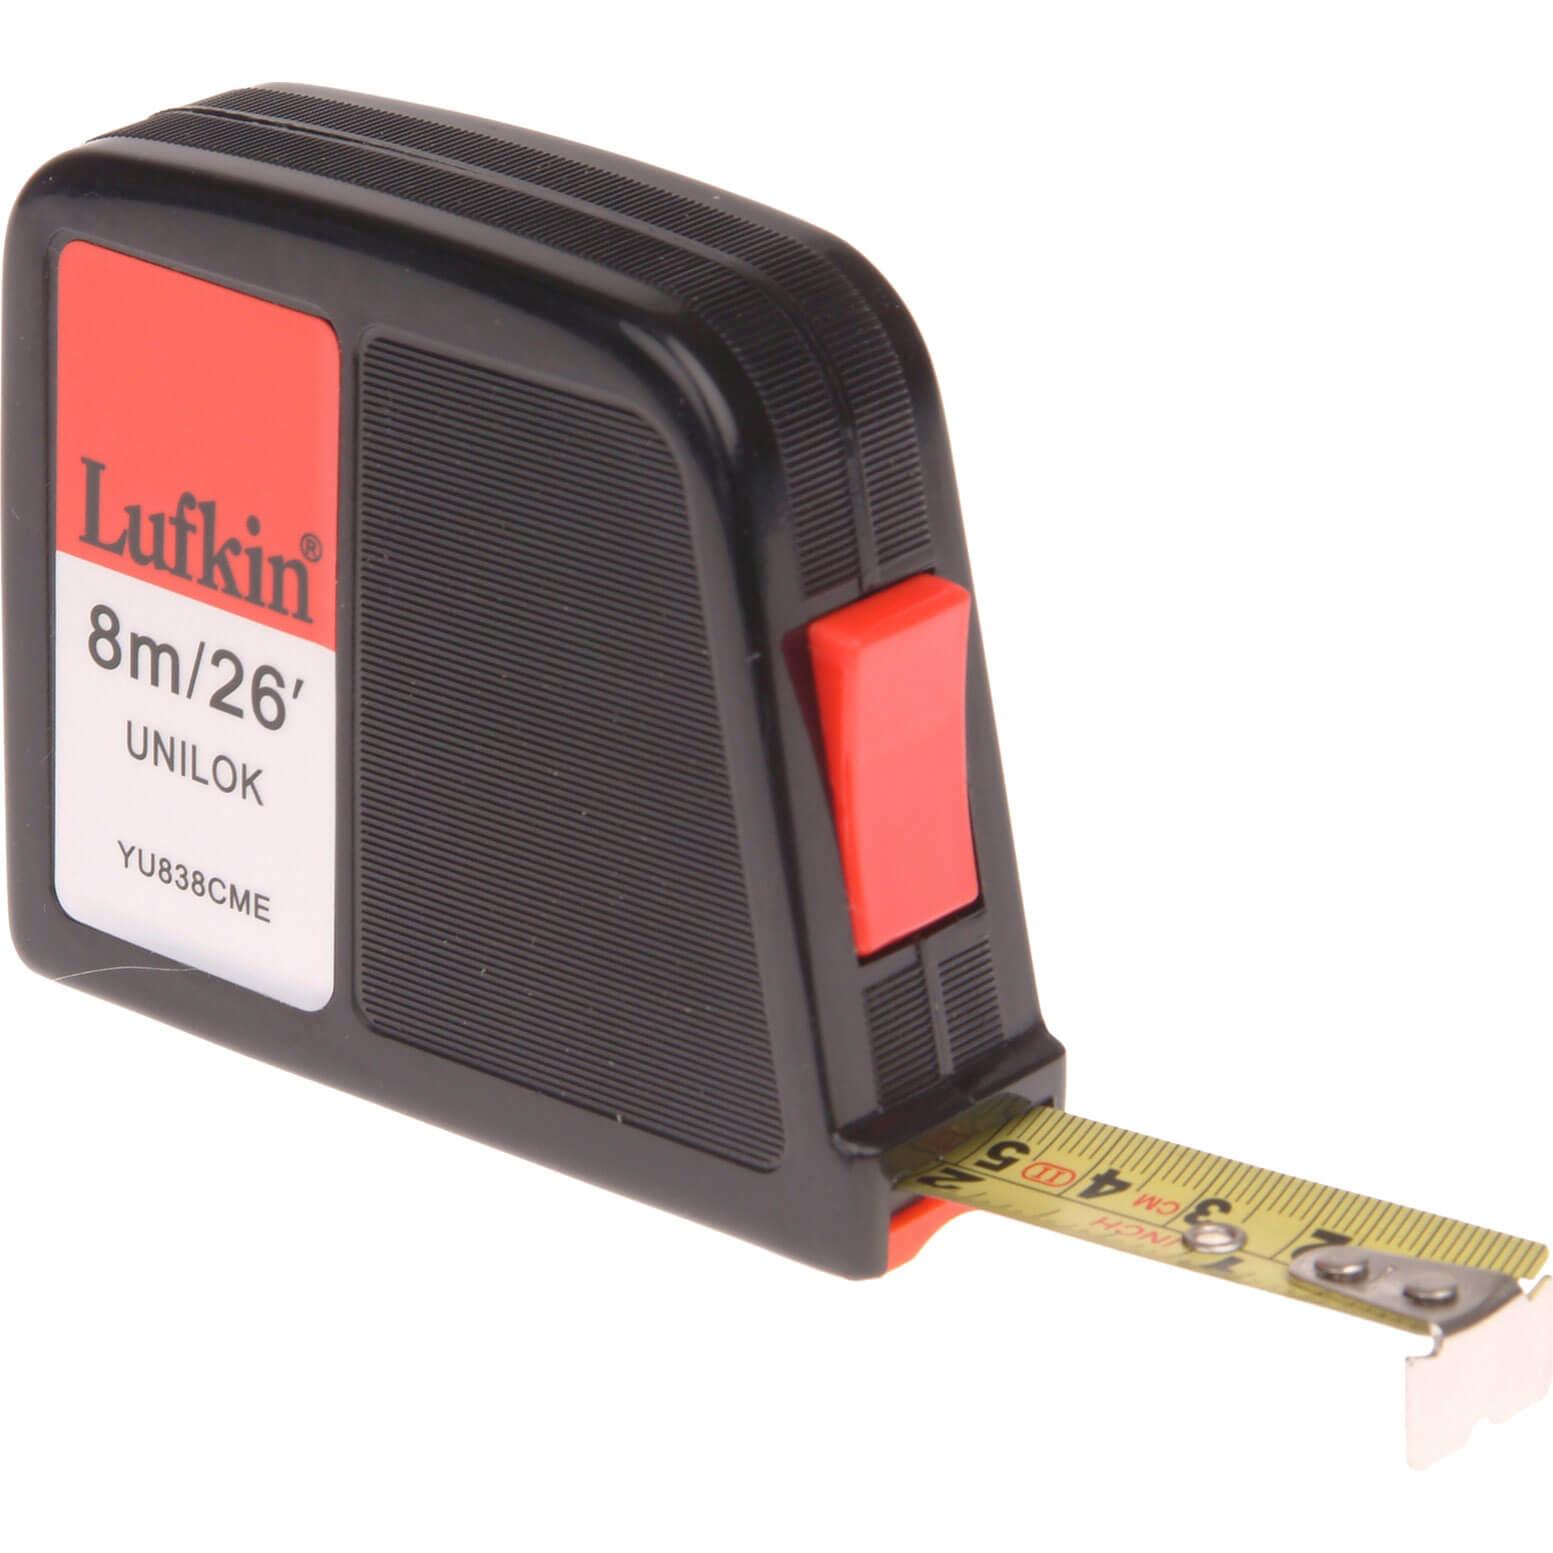 Image of Lufkin Unilok Tape Measure Imperial & Metric 26ft / 8m 19mm